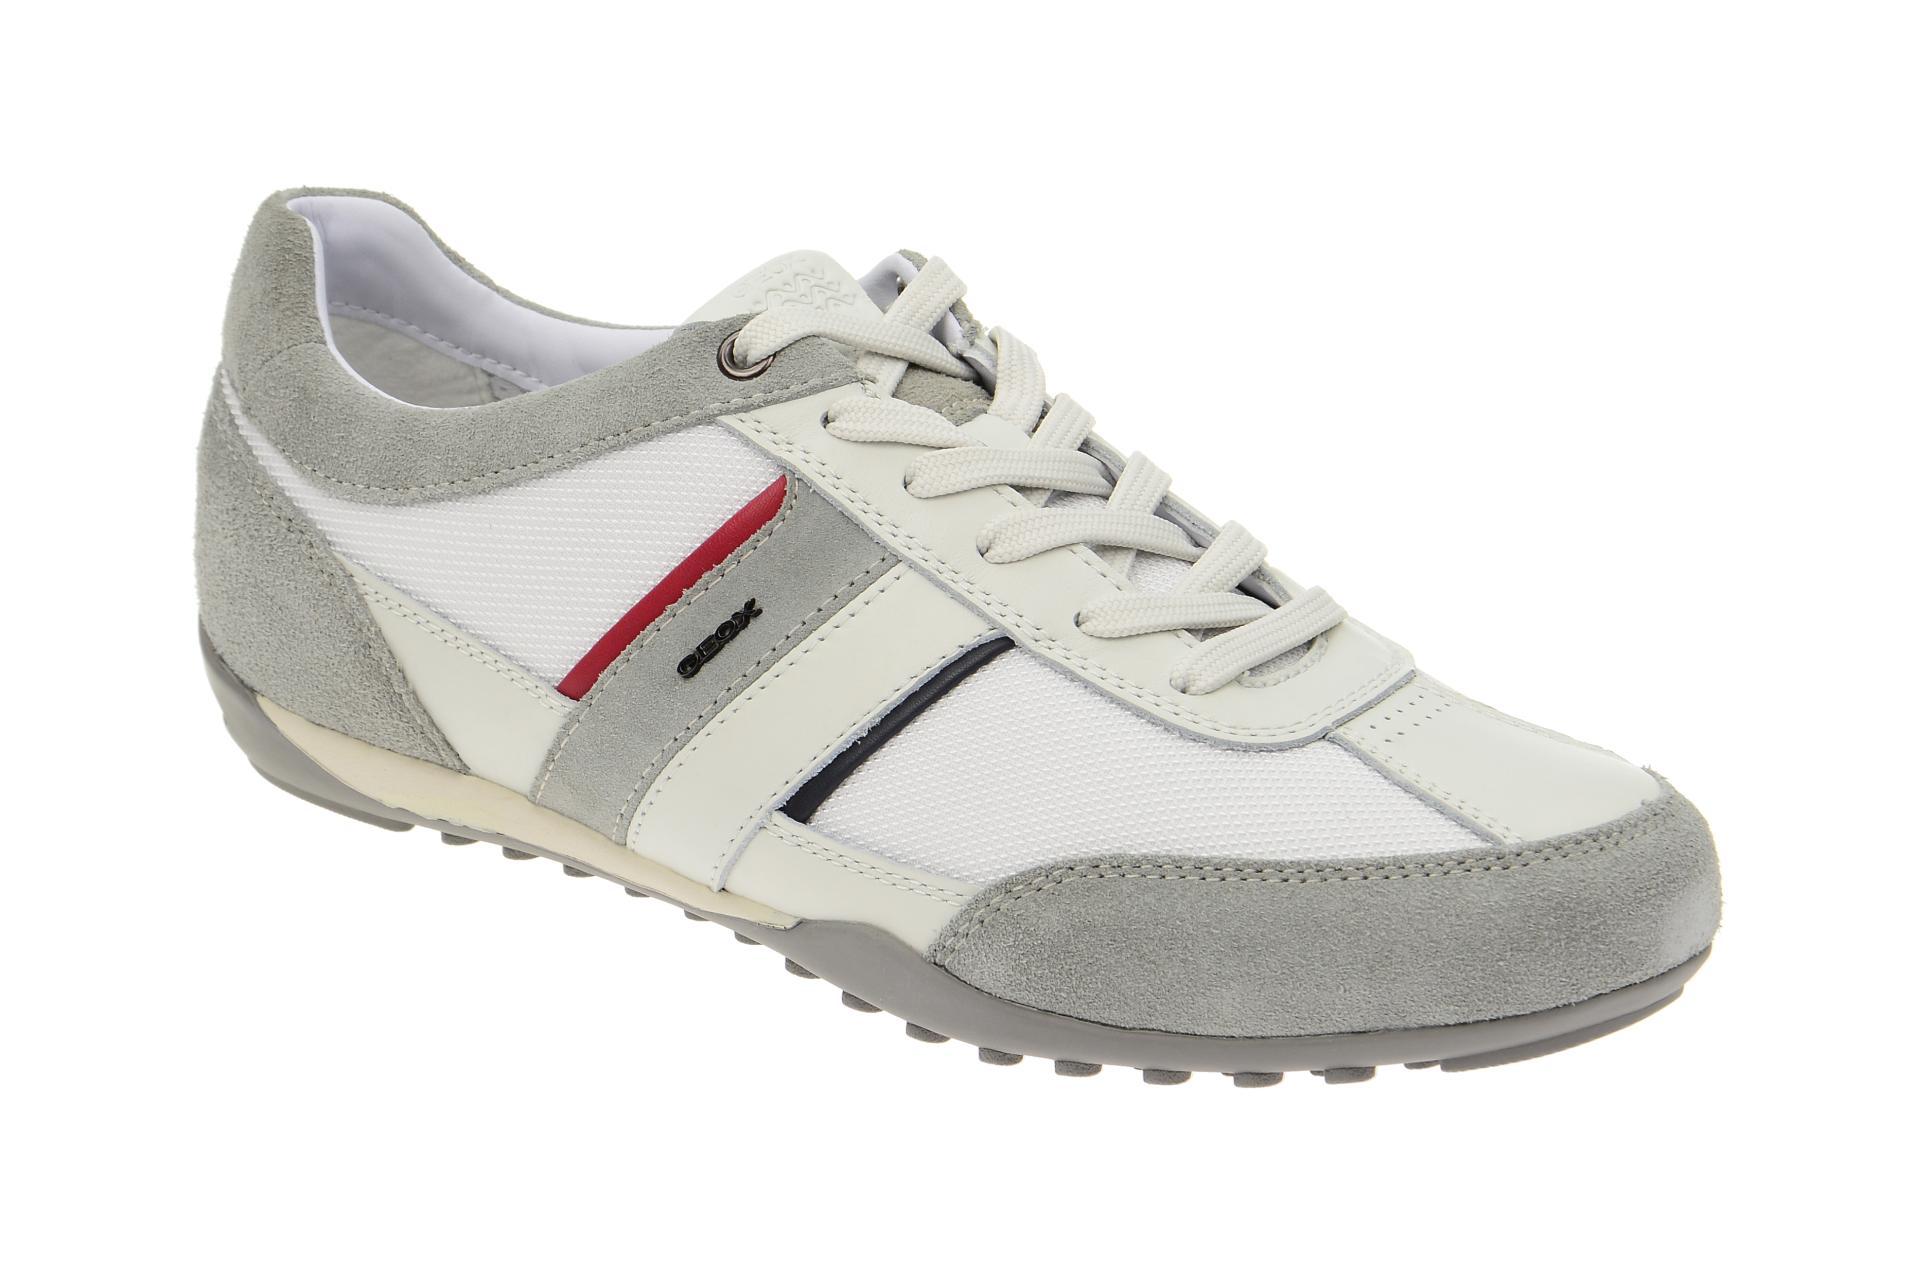 Zu C0130 Geox Wells U52t5c 02211 Details Sportliche Weiß Herrenschuhe Schuhe Halbschuhe D9E2IHW